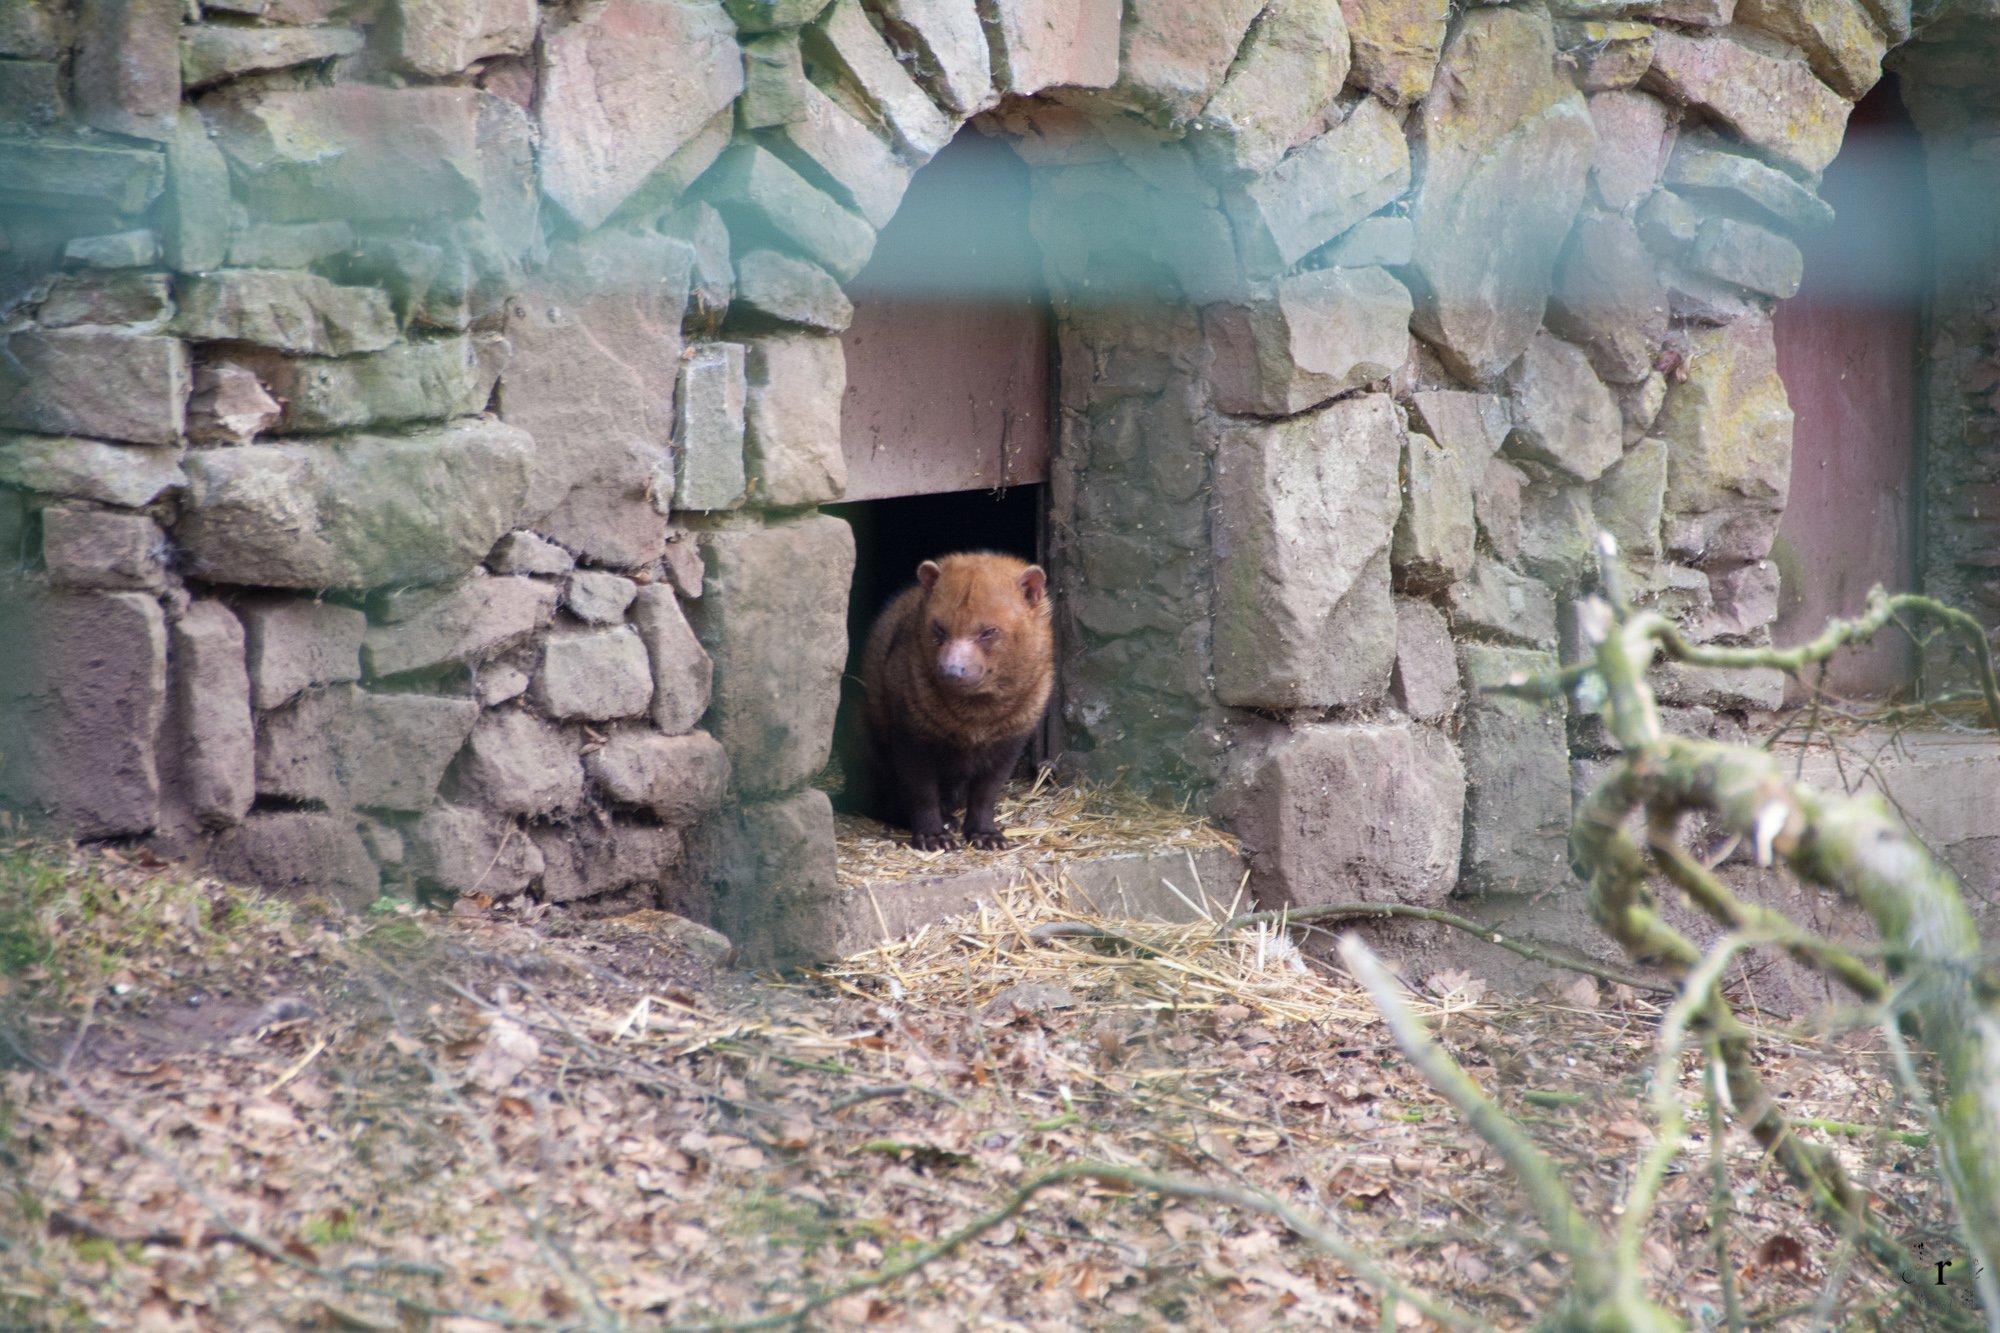 Neunkircher Zoo - Waldhunde